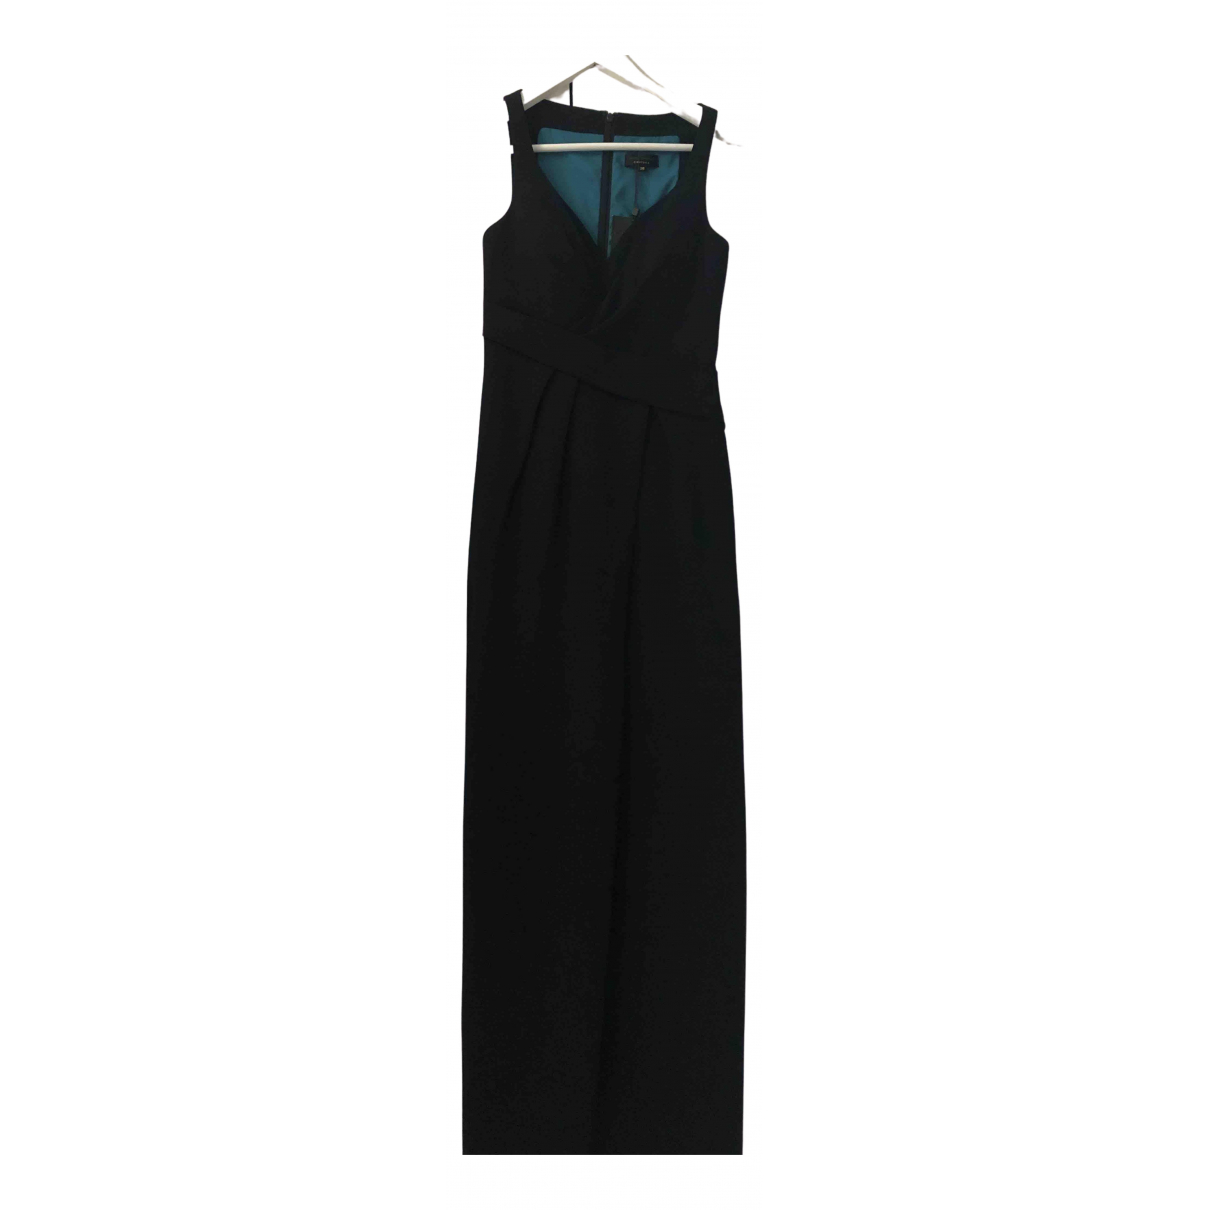 Adolfo Dominguez N Blue dress for Women 36 FR